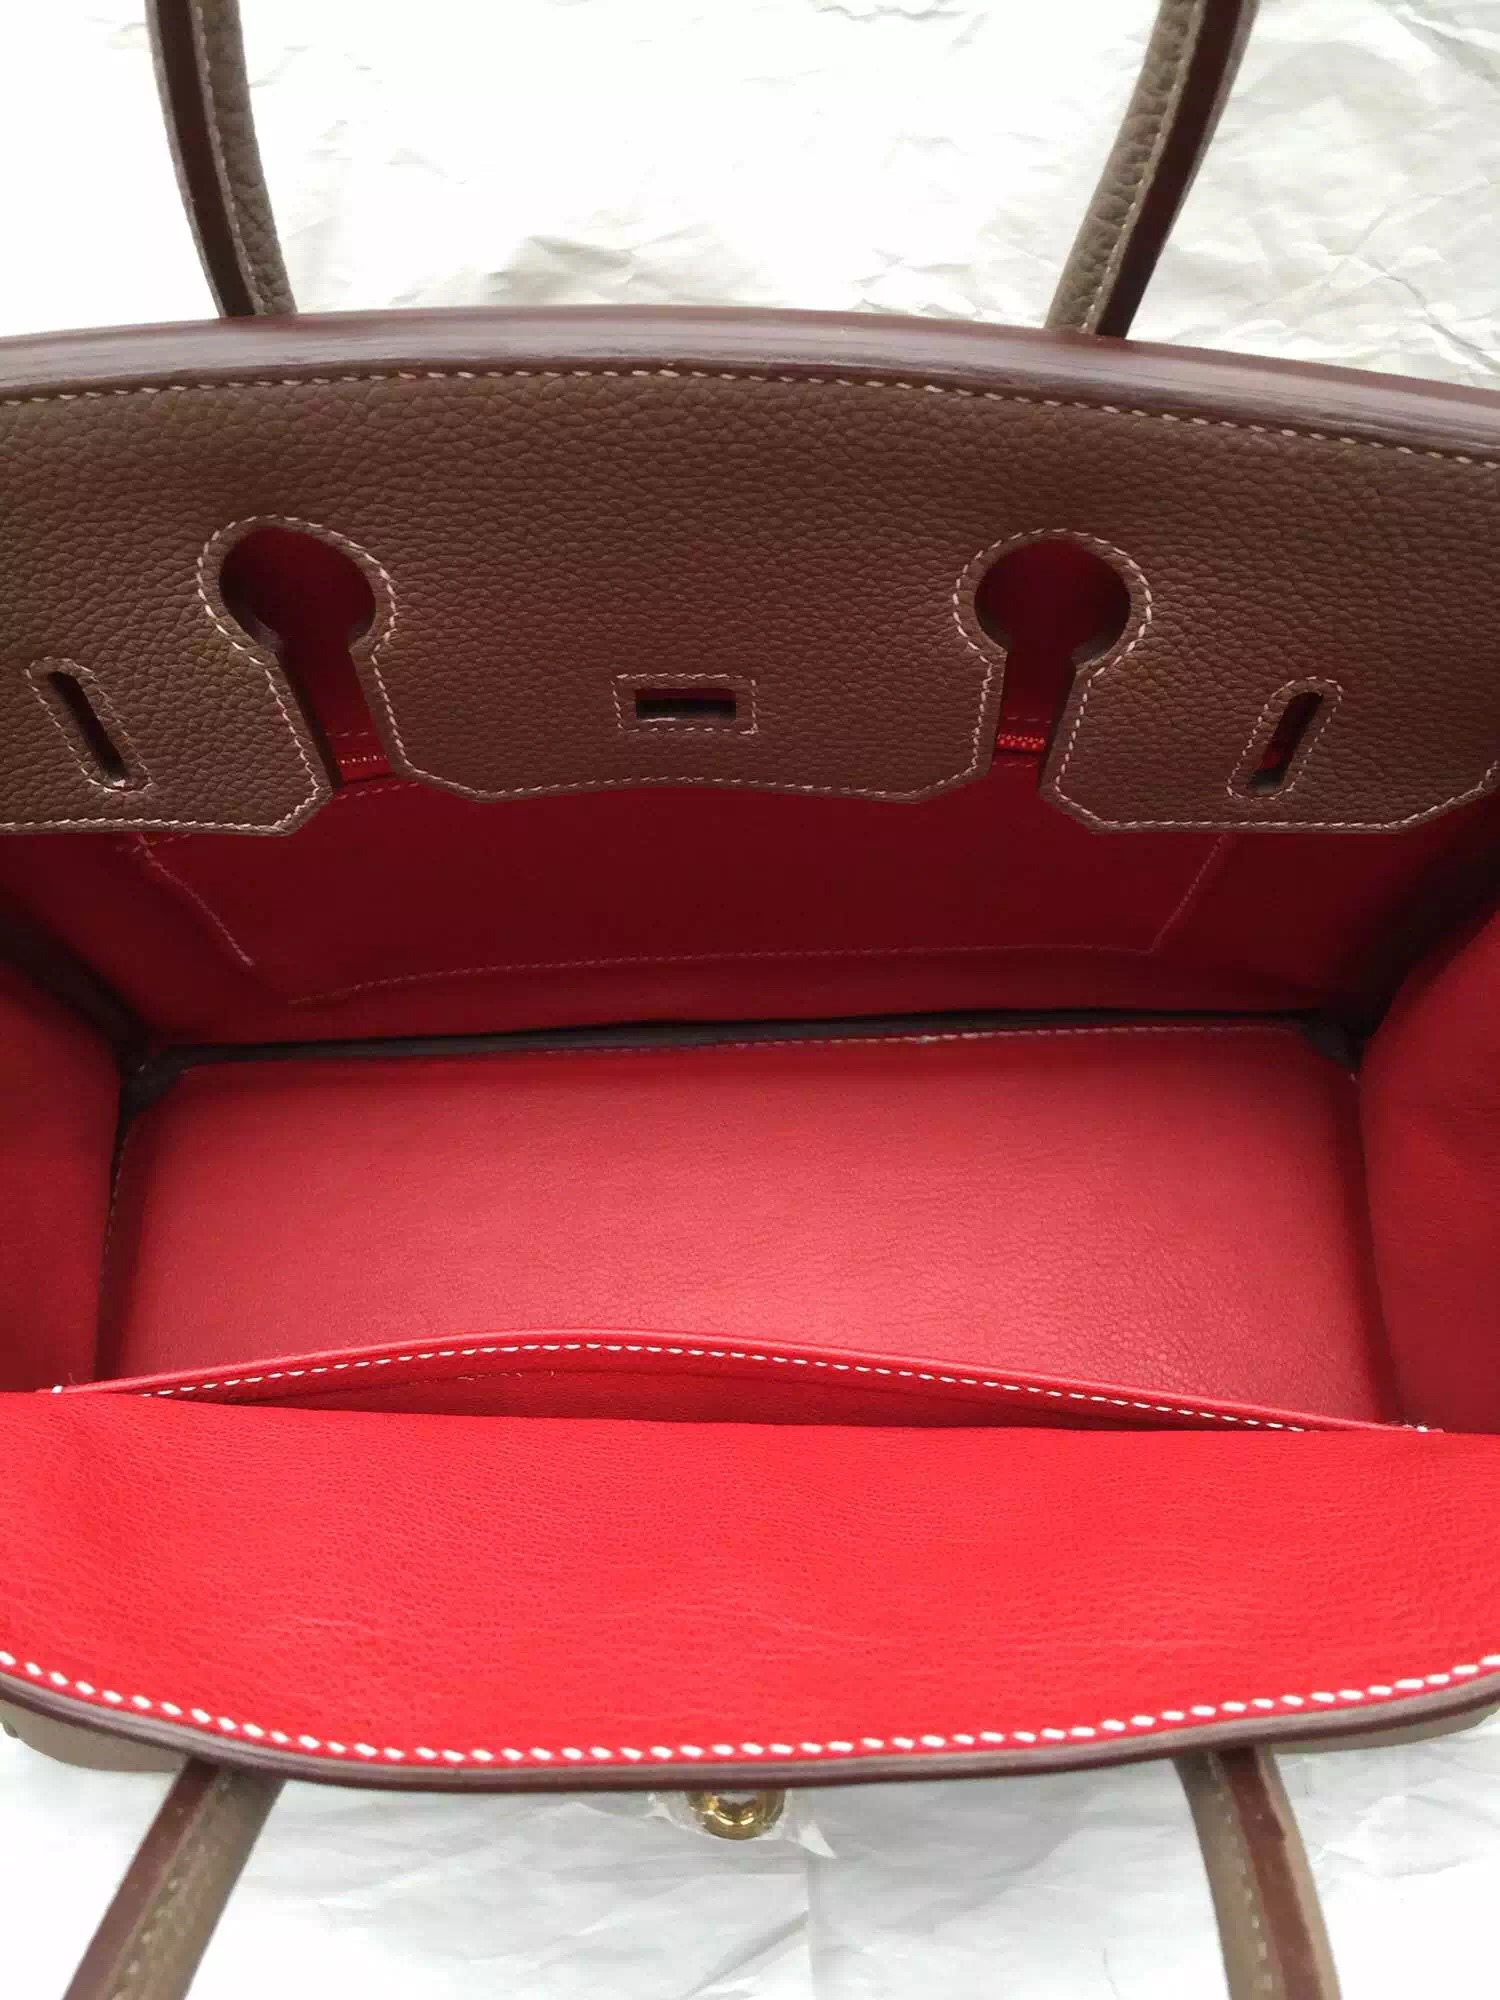 Sale Hermes Birkin Bag Etoupe Grey/Q5 Red Togo Leather Women's Tote Handbag